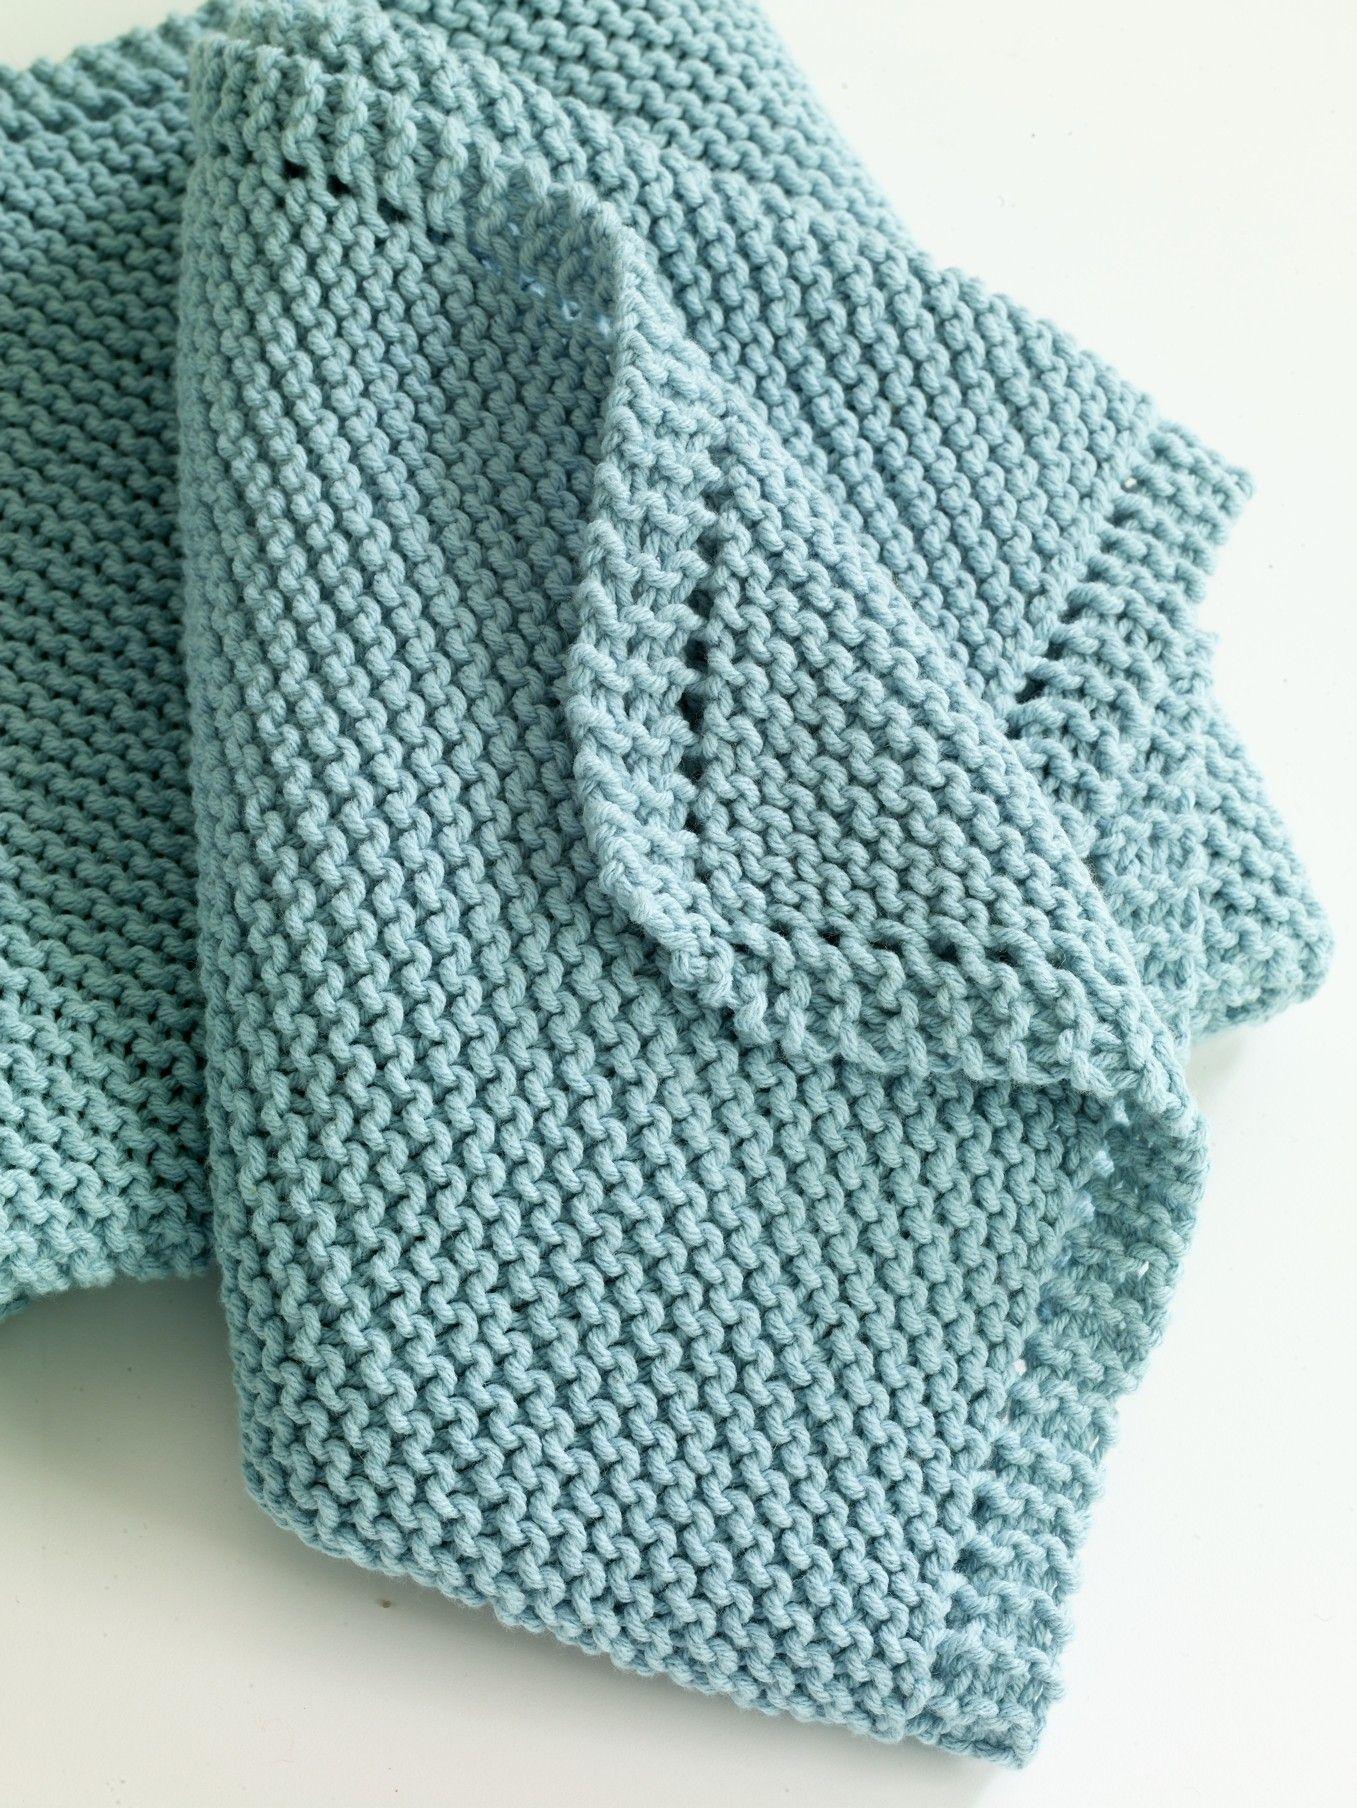 Diagonal Comfort Blanket Pattern (Knit) - Lion Brand Yarn   knitting ...